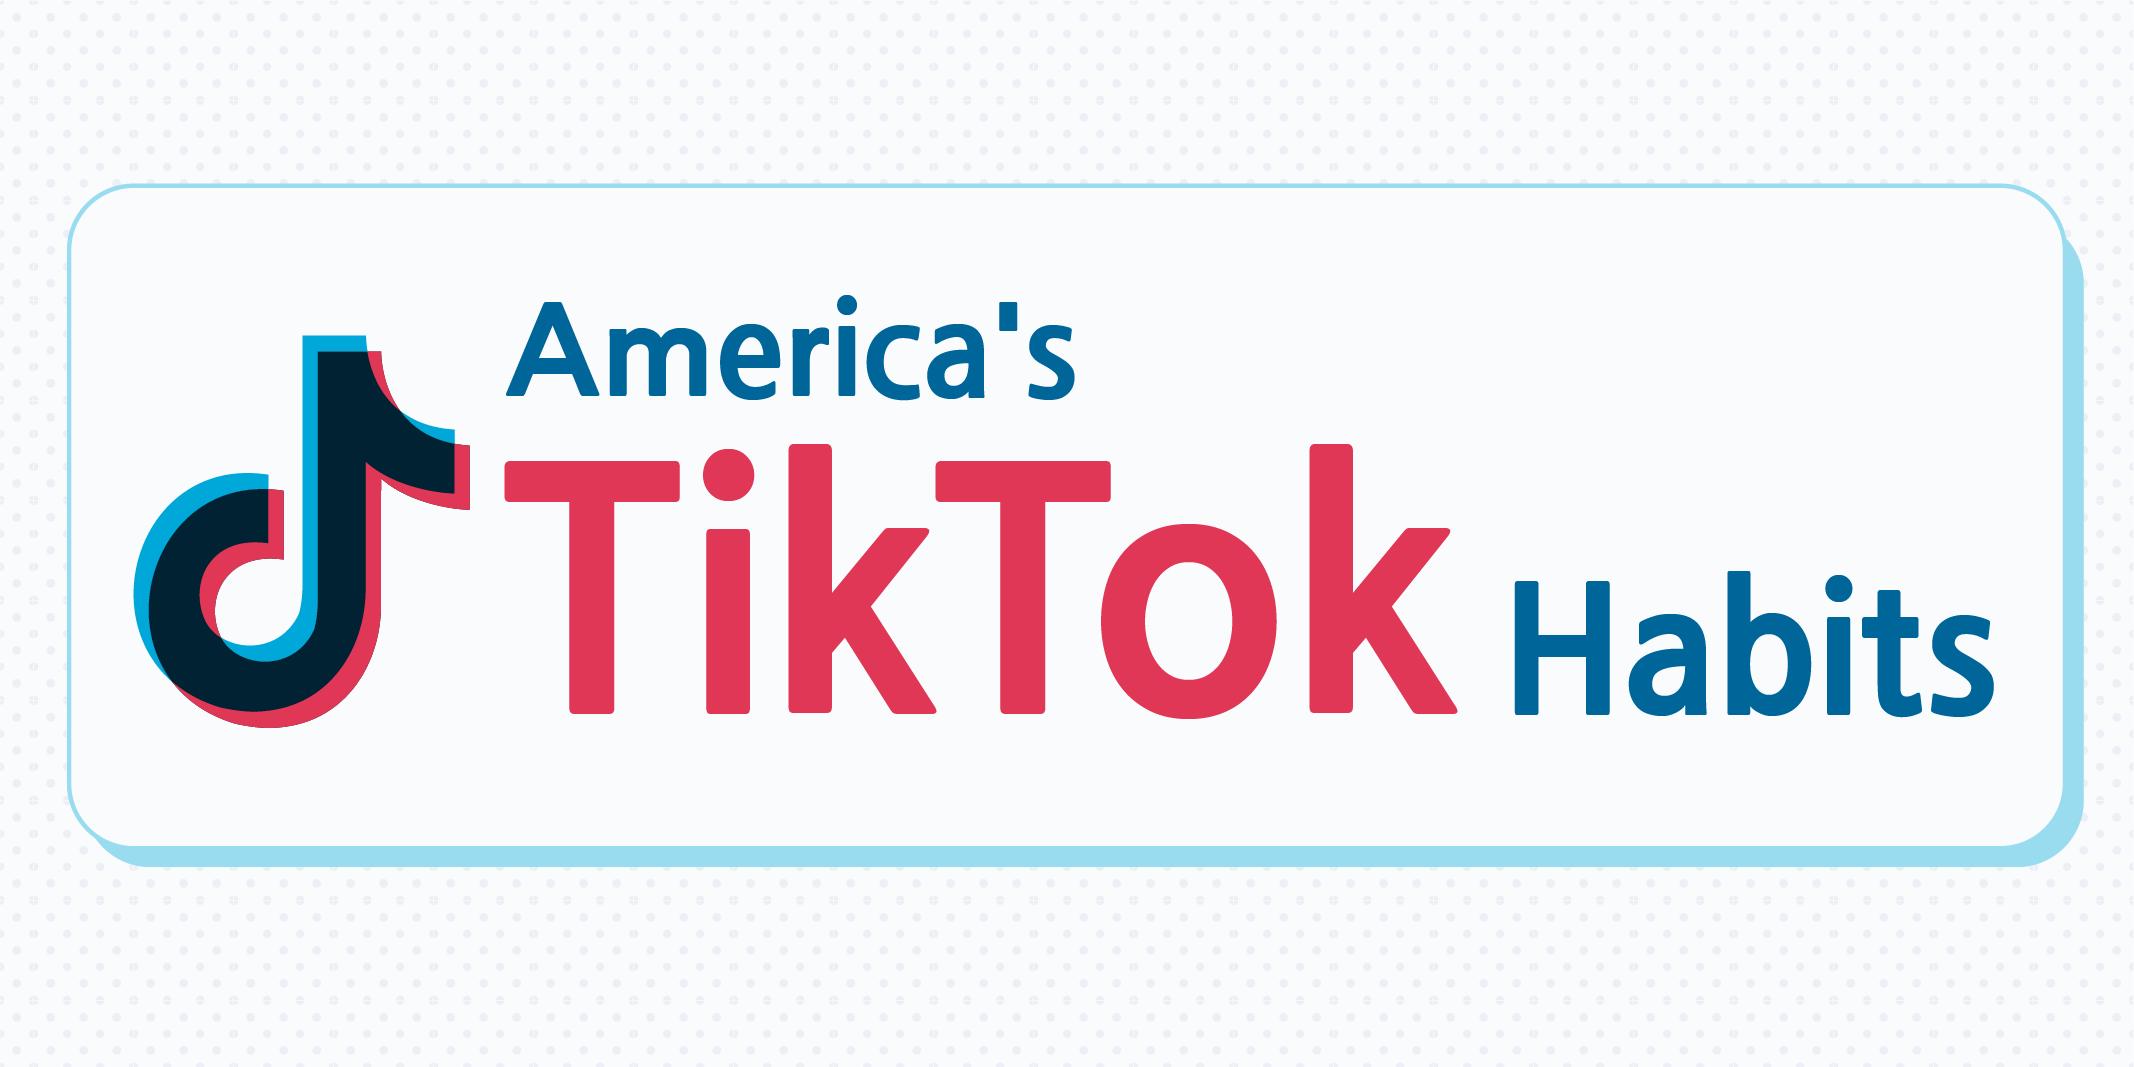 America's Tiktok Habits